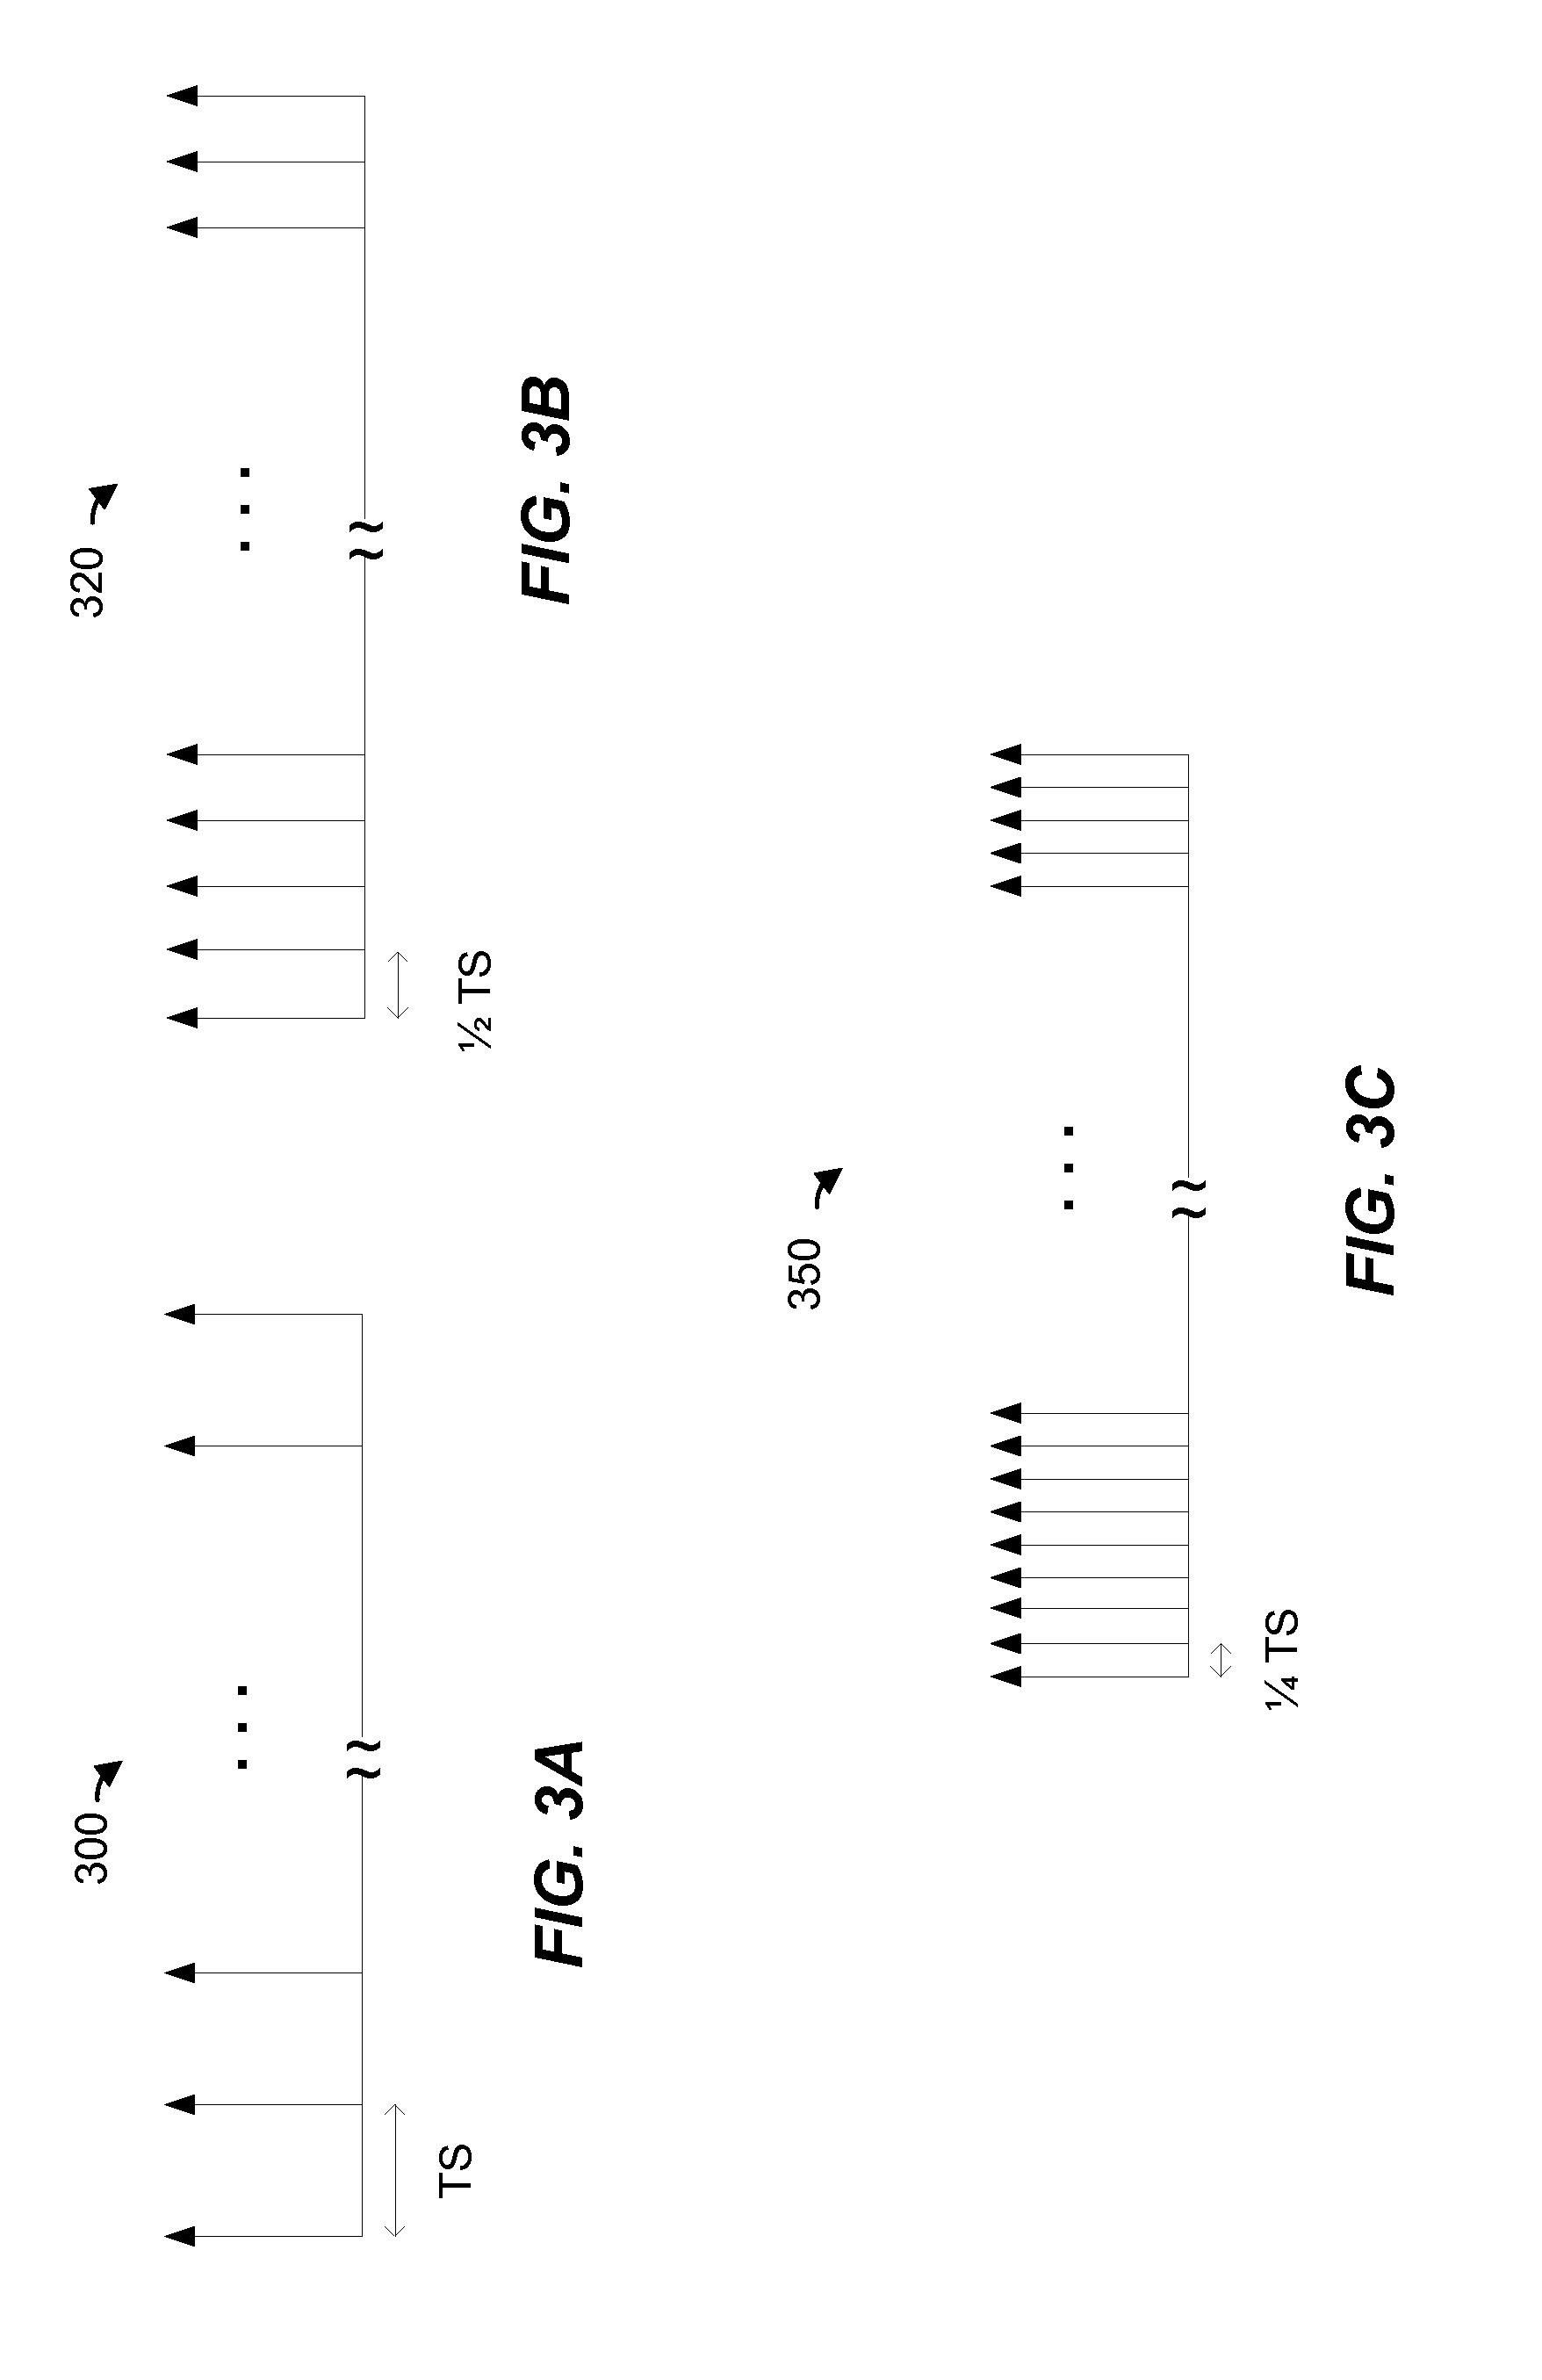 Patent US 9,954,703 B2